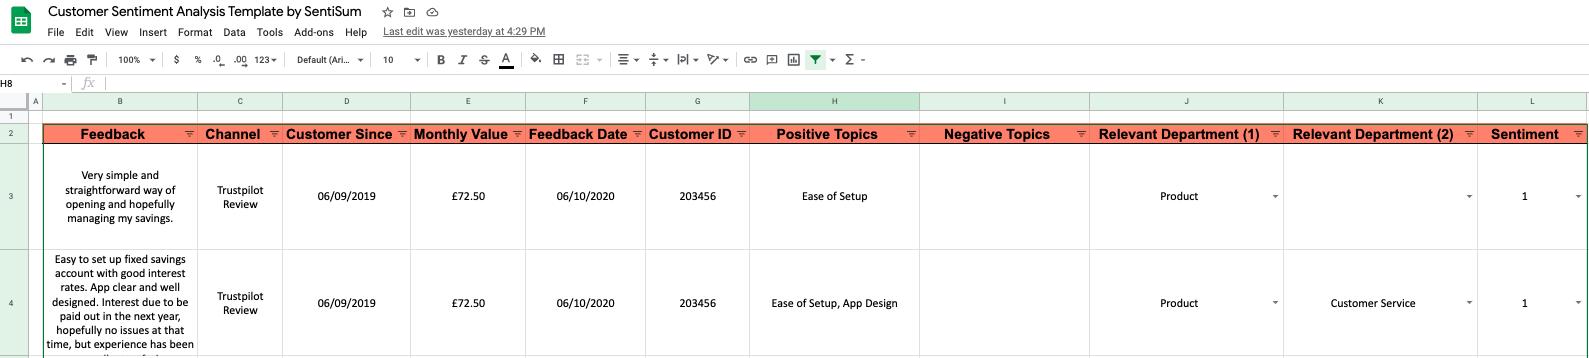 Customer sentiment analysis template